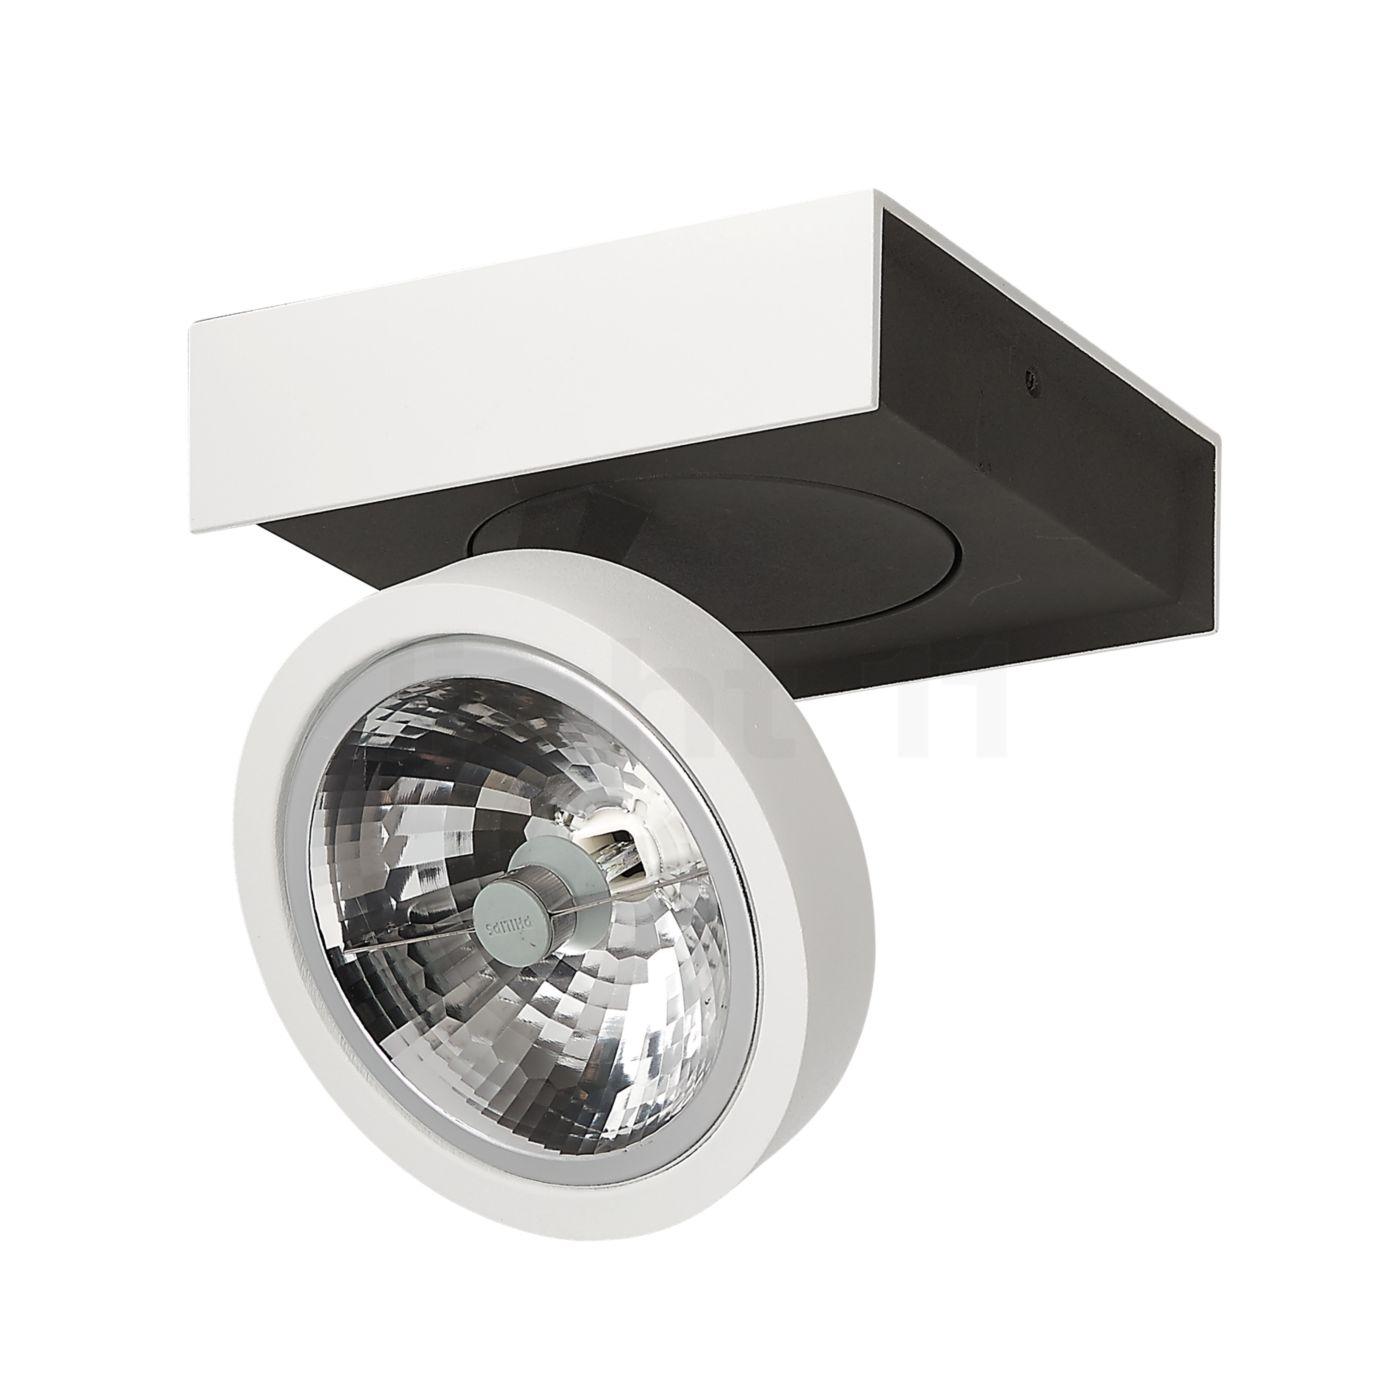 lirio by philips bonq plafondlamp kopen bij light11nl